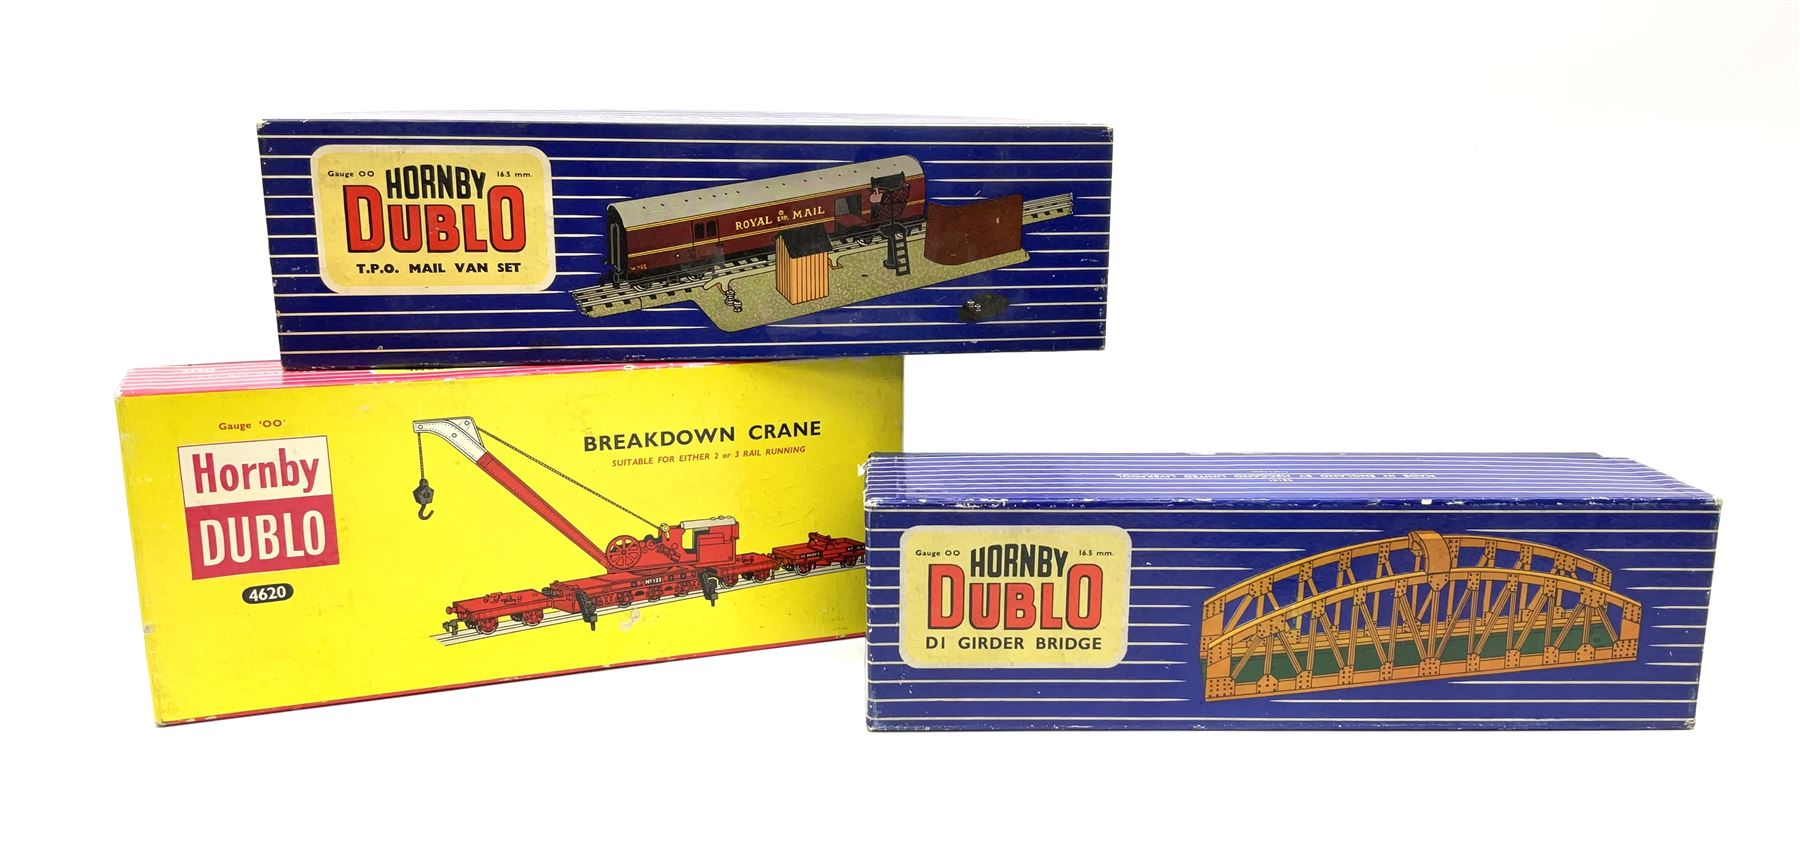 Hornby Dublo - Breakdown Crane No.4062 boxed with screw jacks; D1 Girder Bridge